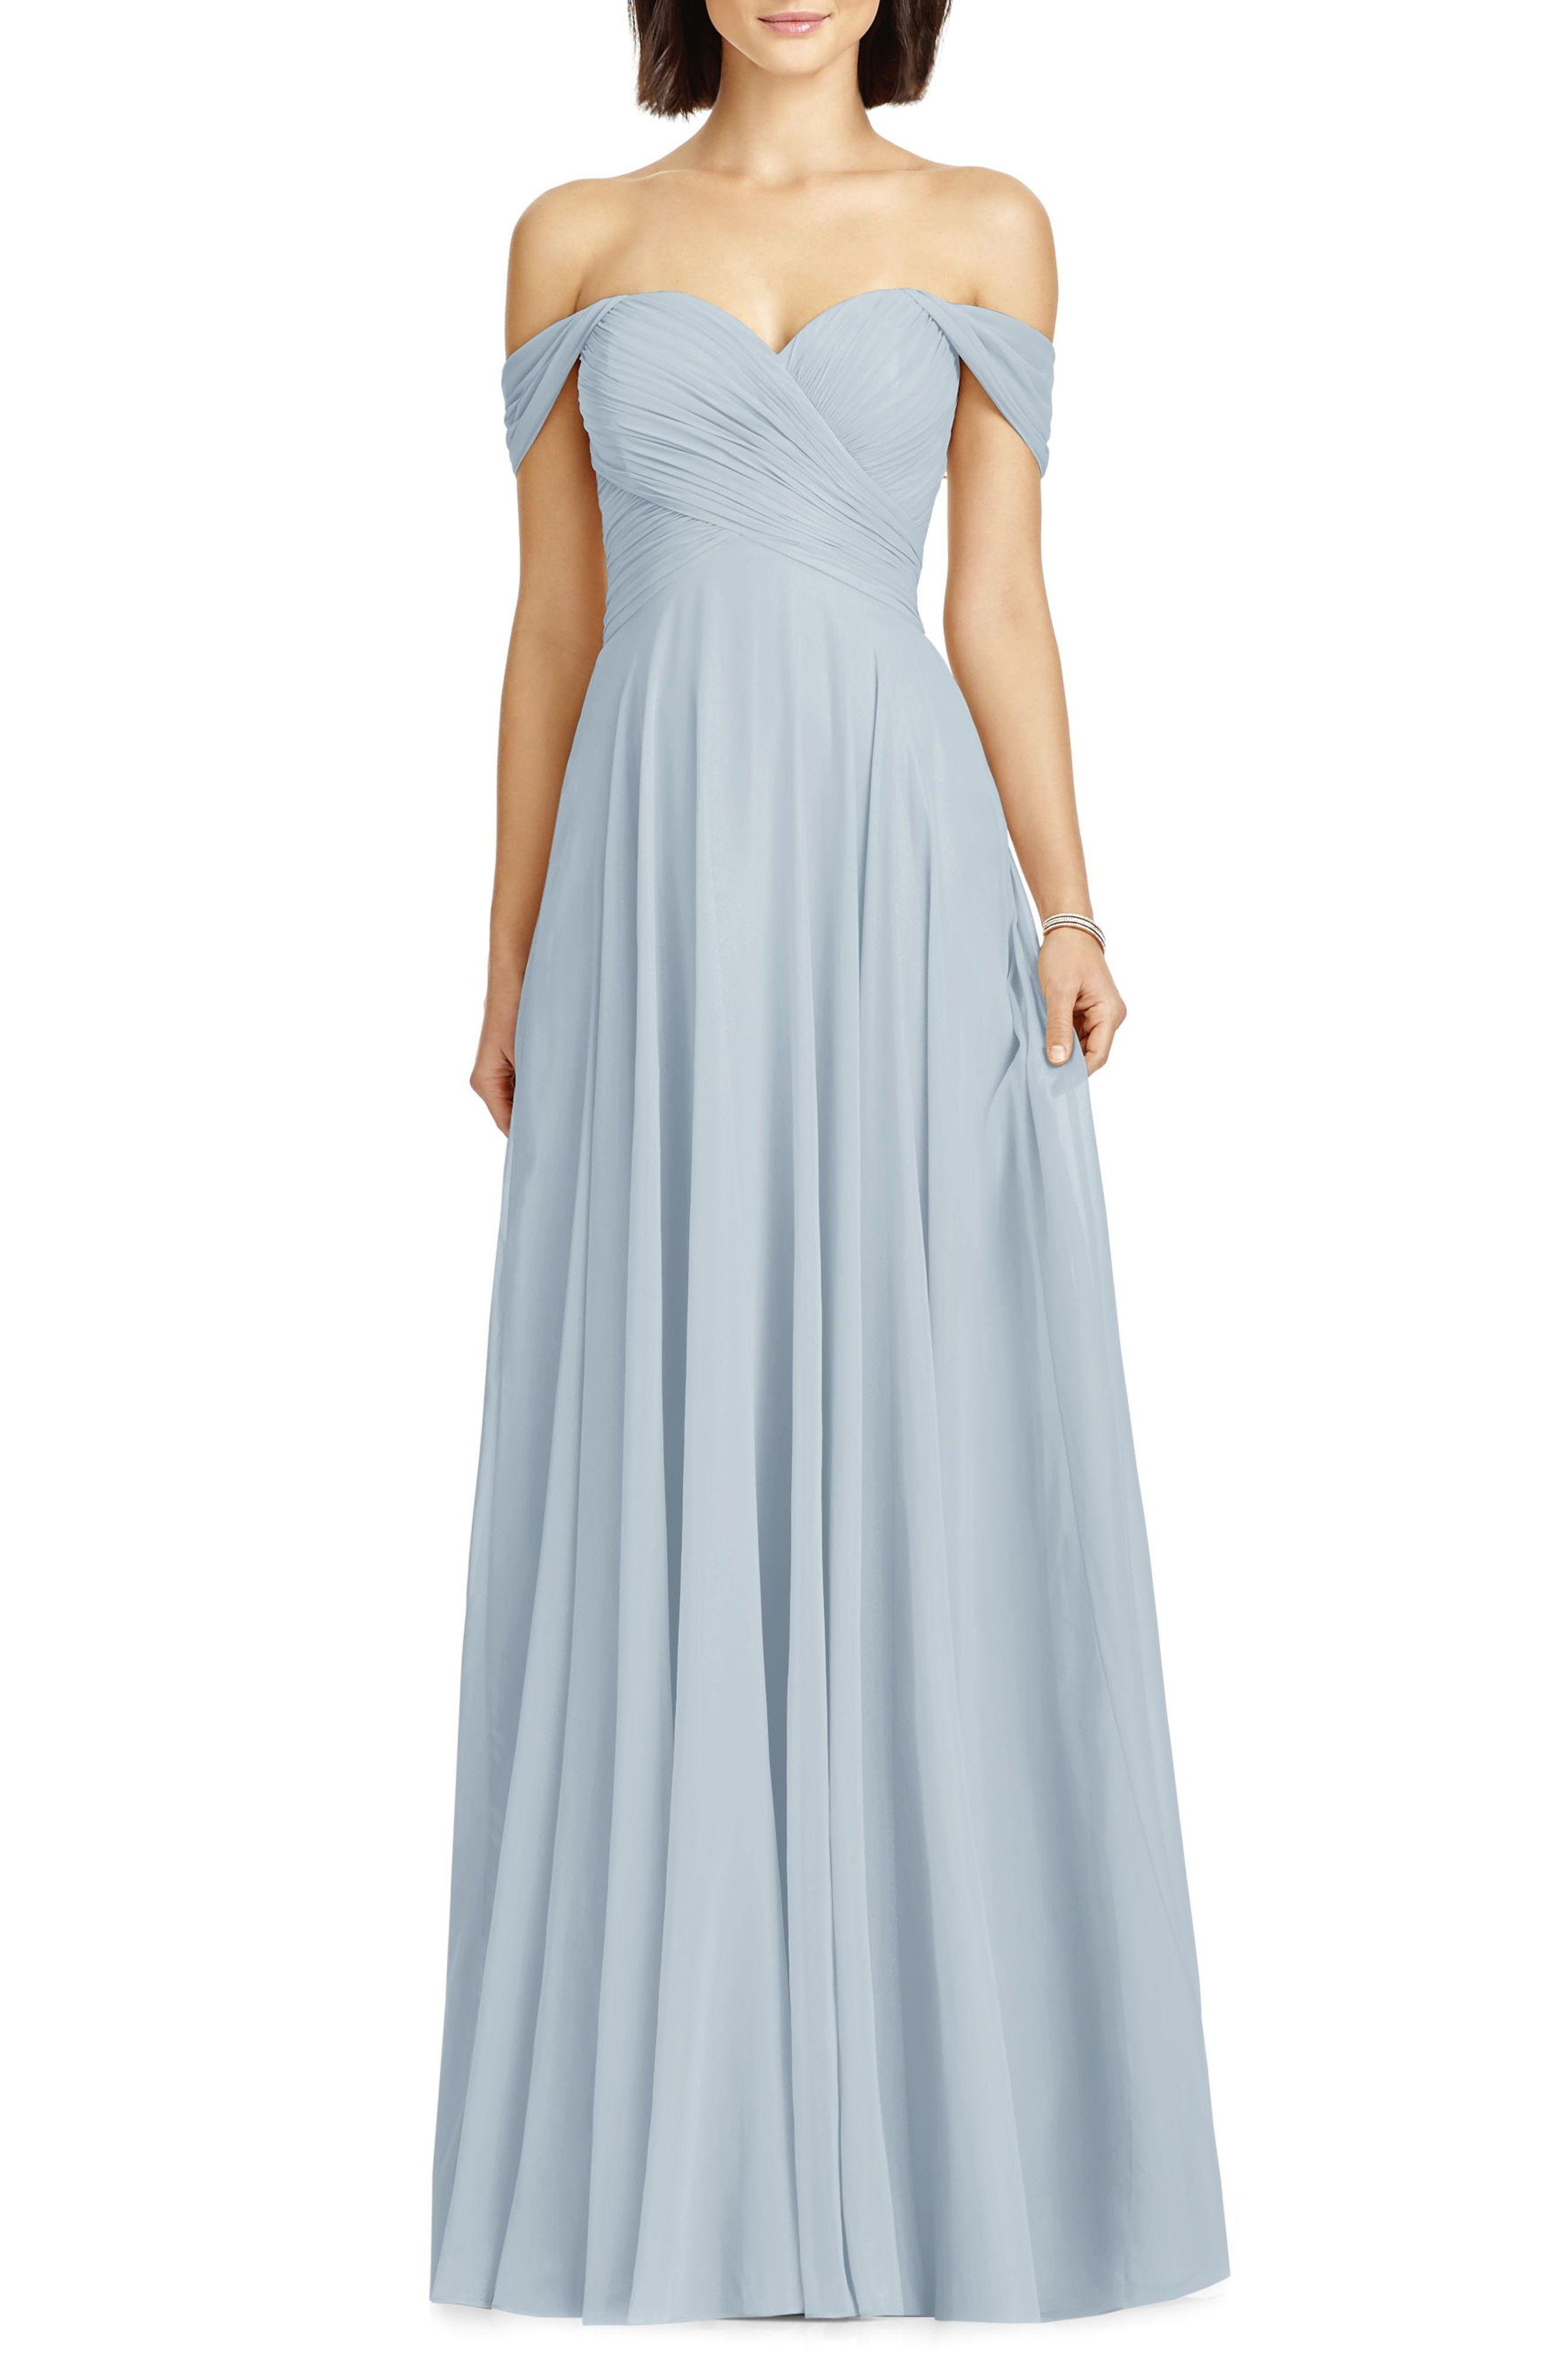 Lux Off the Shoulder Chiffon Gown- pale blue bridesmaid dress ...